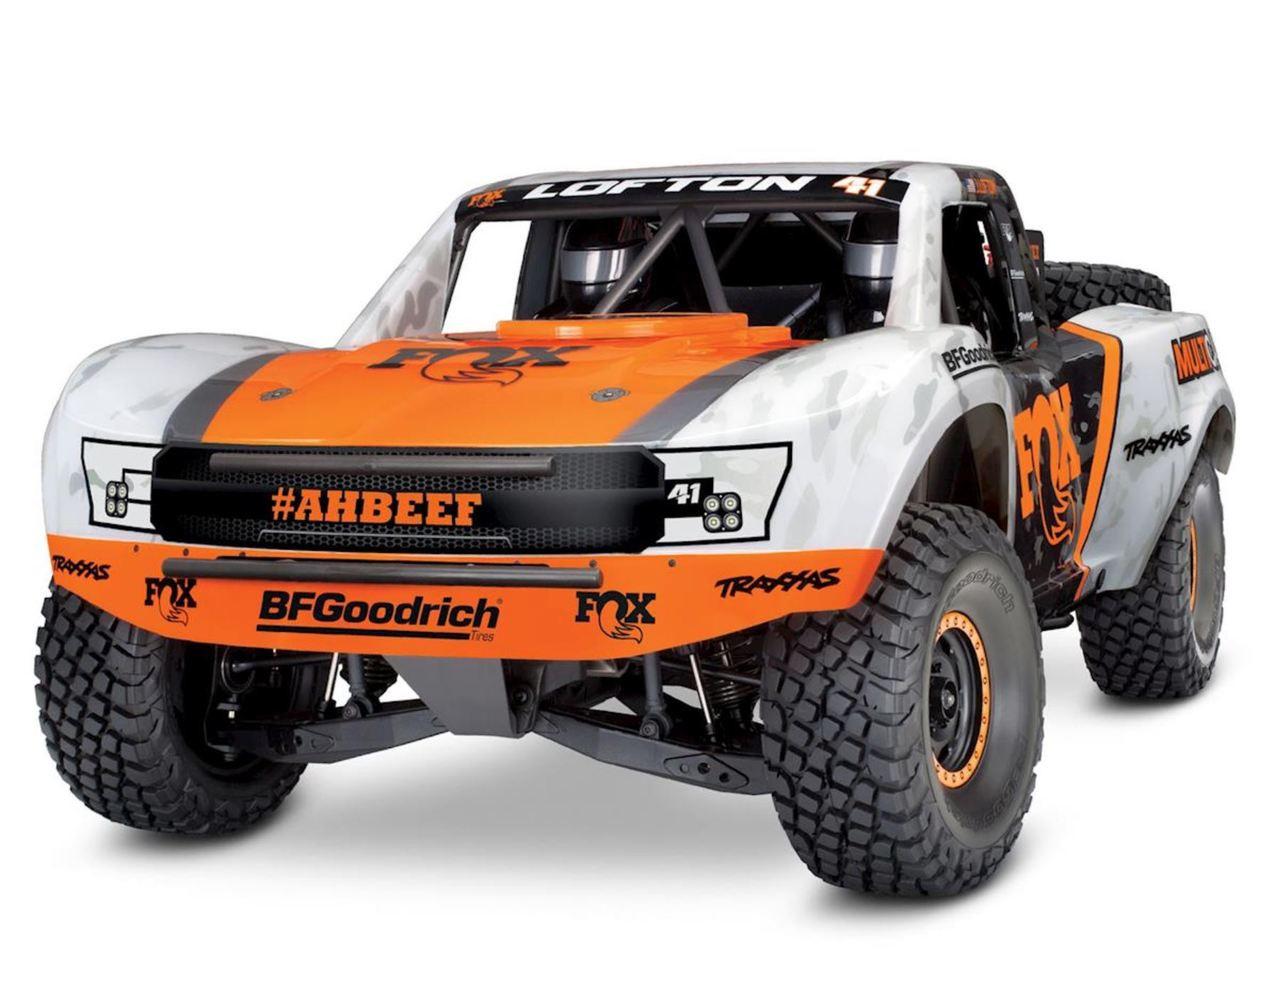 Traxxas 85076-4 Unlimited Desert Racer 4WD RC Race Truck